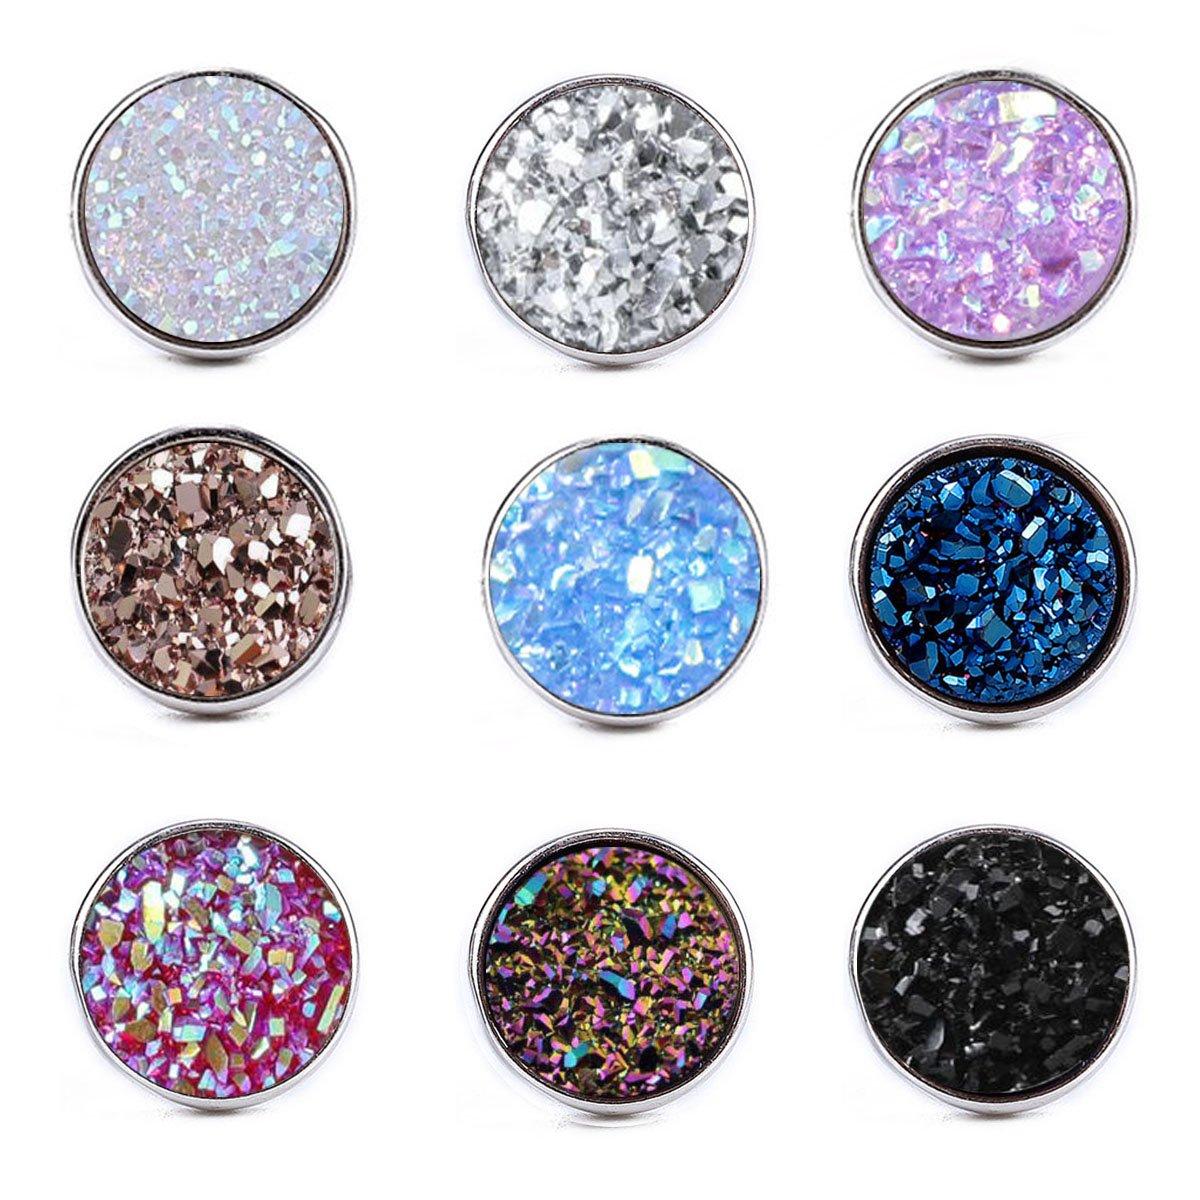 Dolovely Stainless Steel Druzy Stud Earrings Set for Girls Women Hypoallergenic Pierced Earrings 9 Pairs